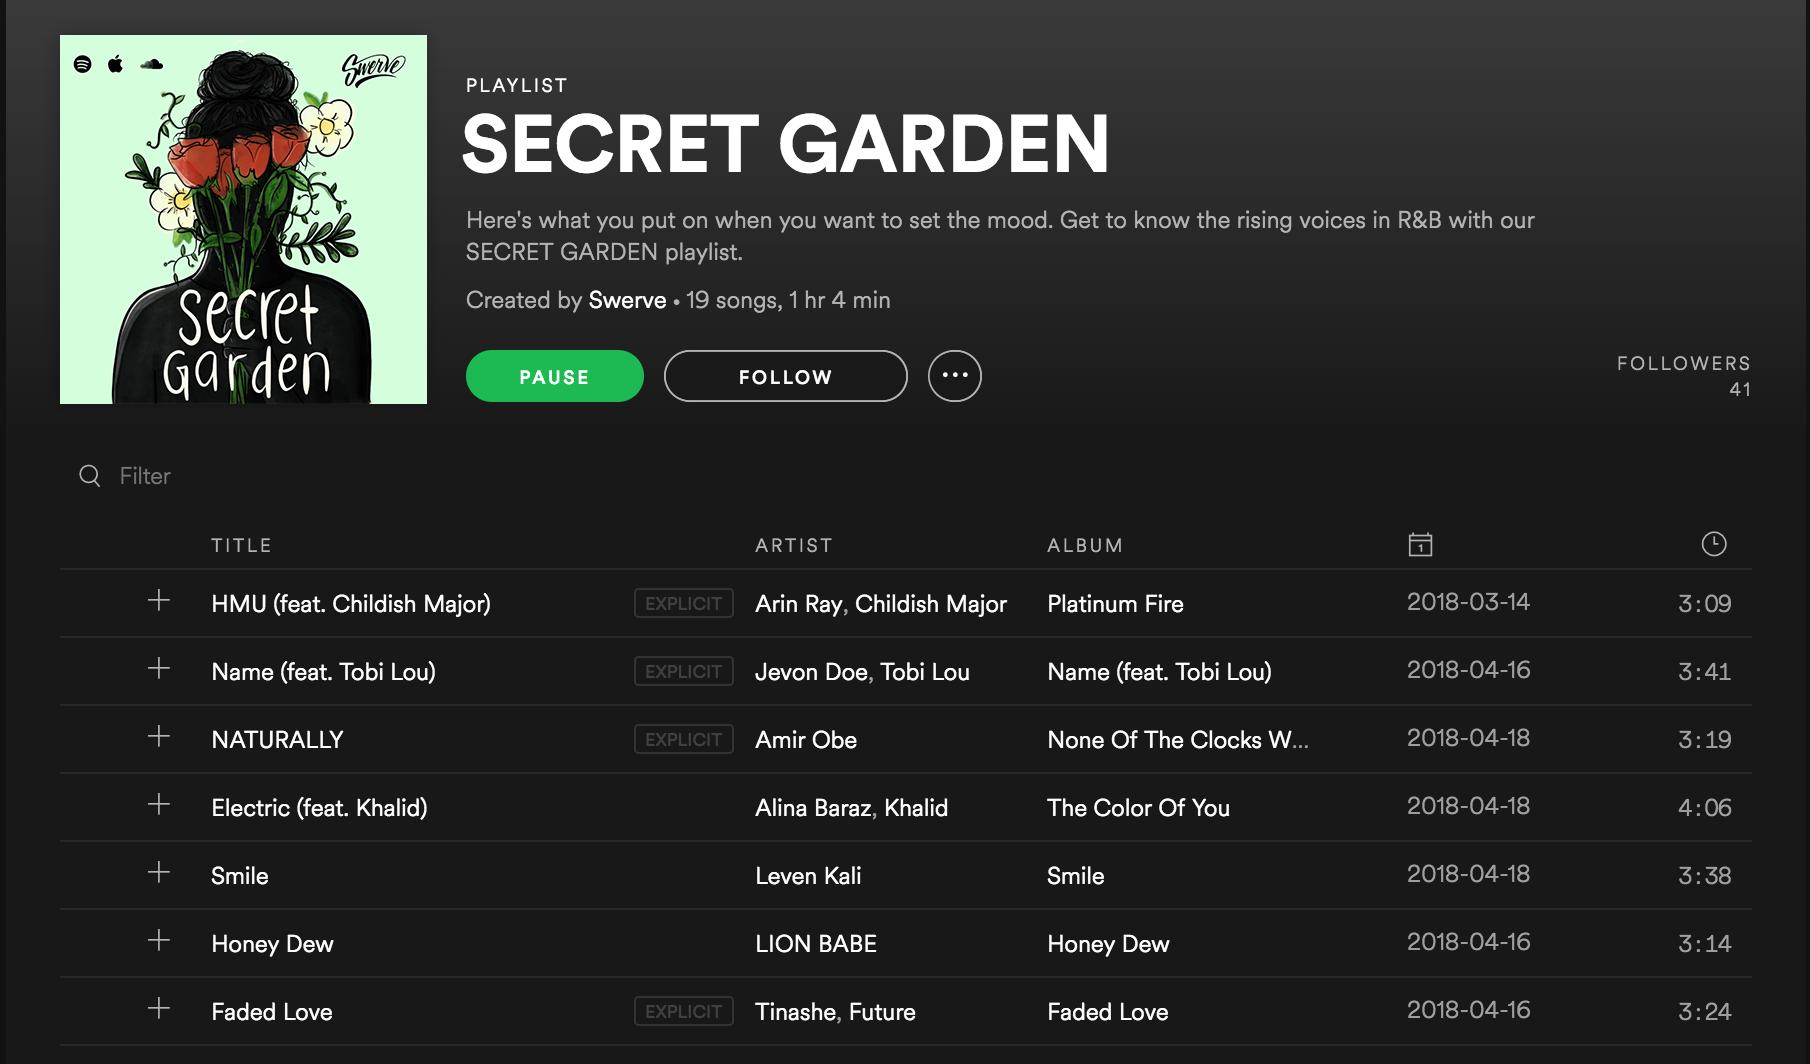 Screenshot of Secret Garden playlist on Spotify